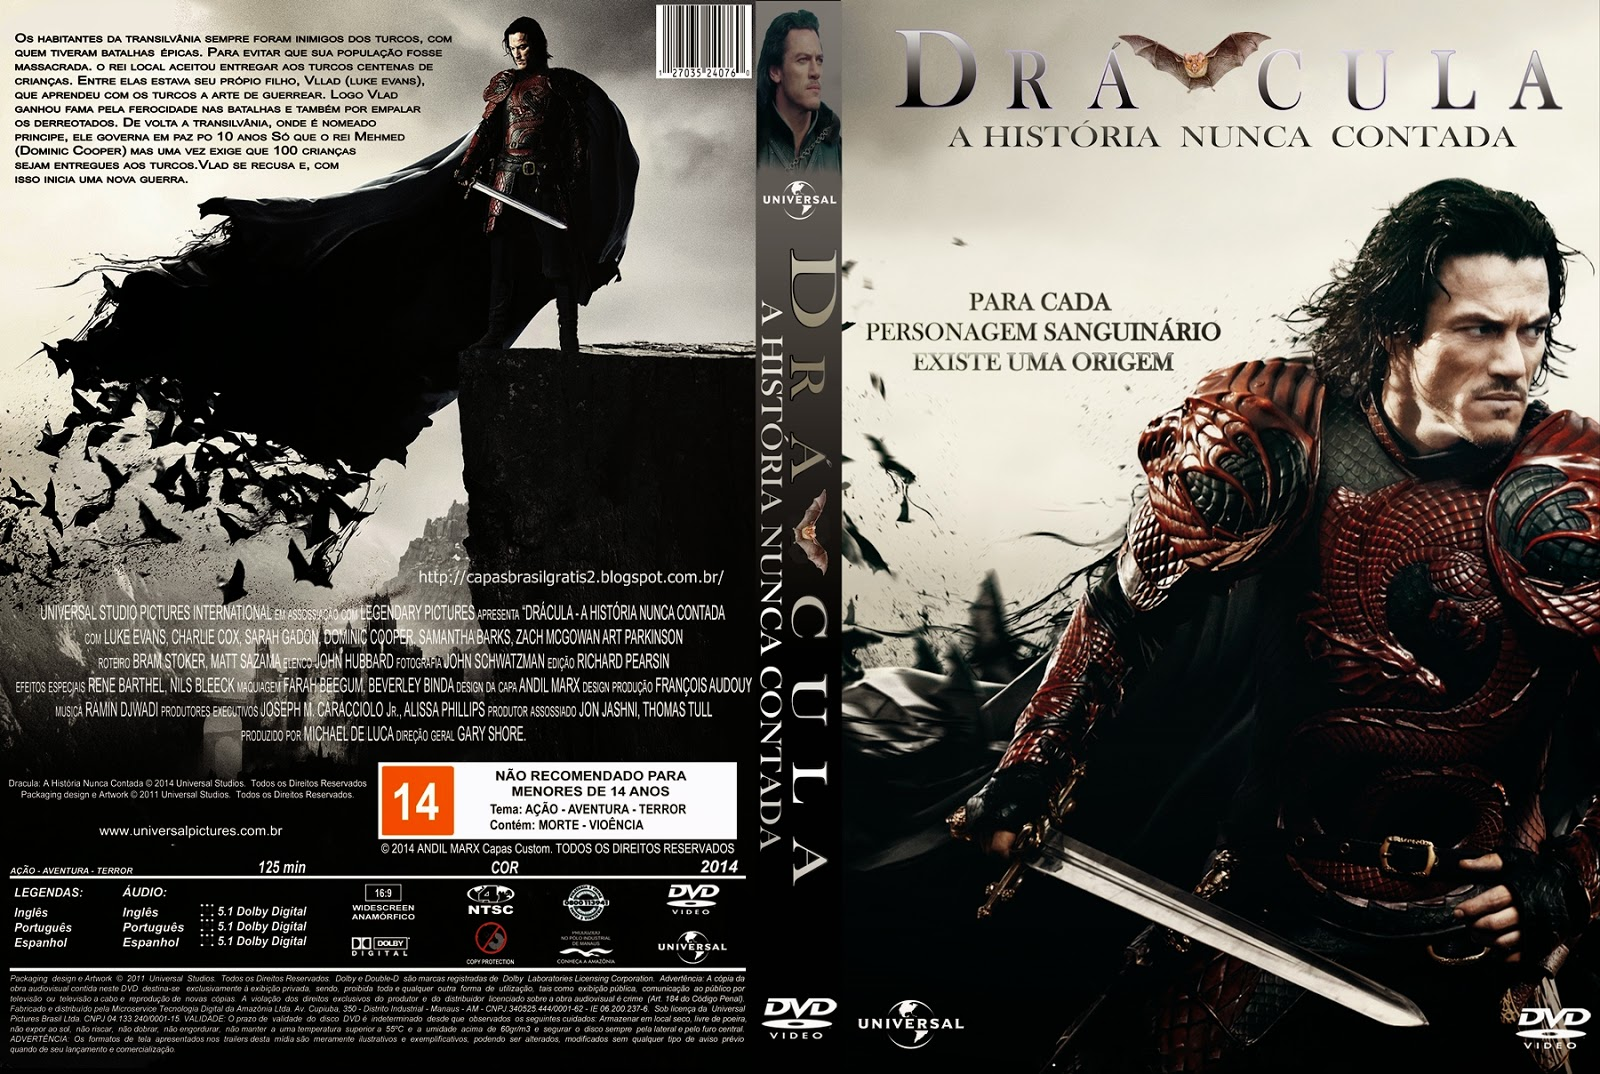 Download Drácula A História Nunca Contada DVD-R Dr C3 A1cula 2B  2BA 2BHist C3 B3ria 2BNunca 2BContada 2B02